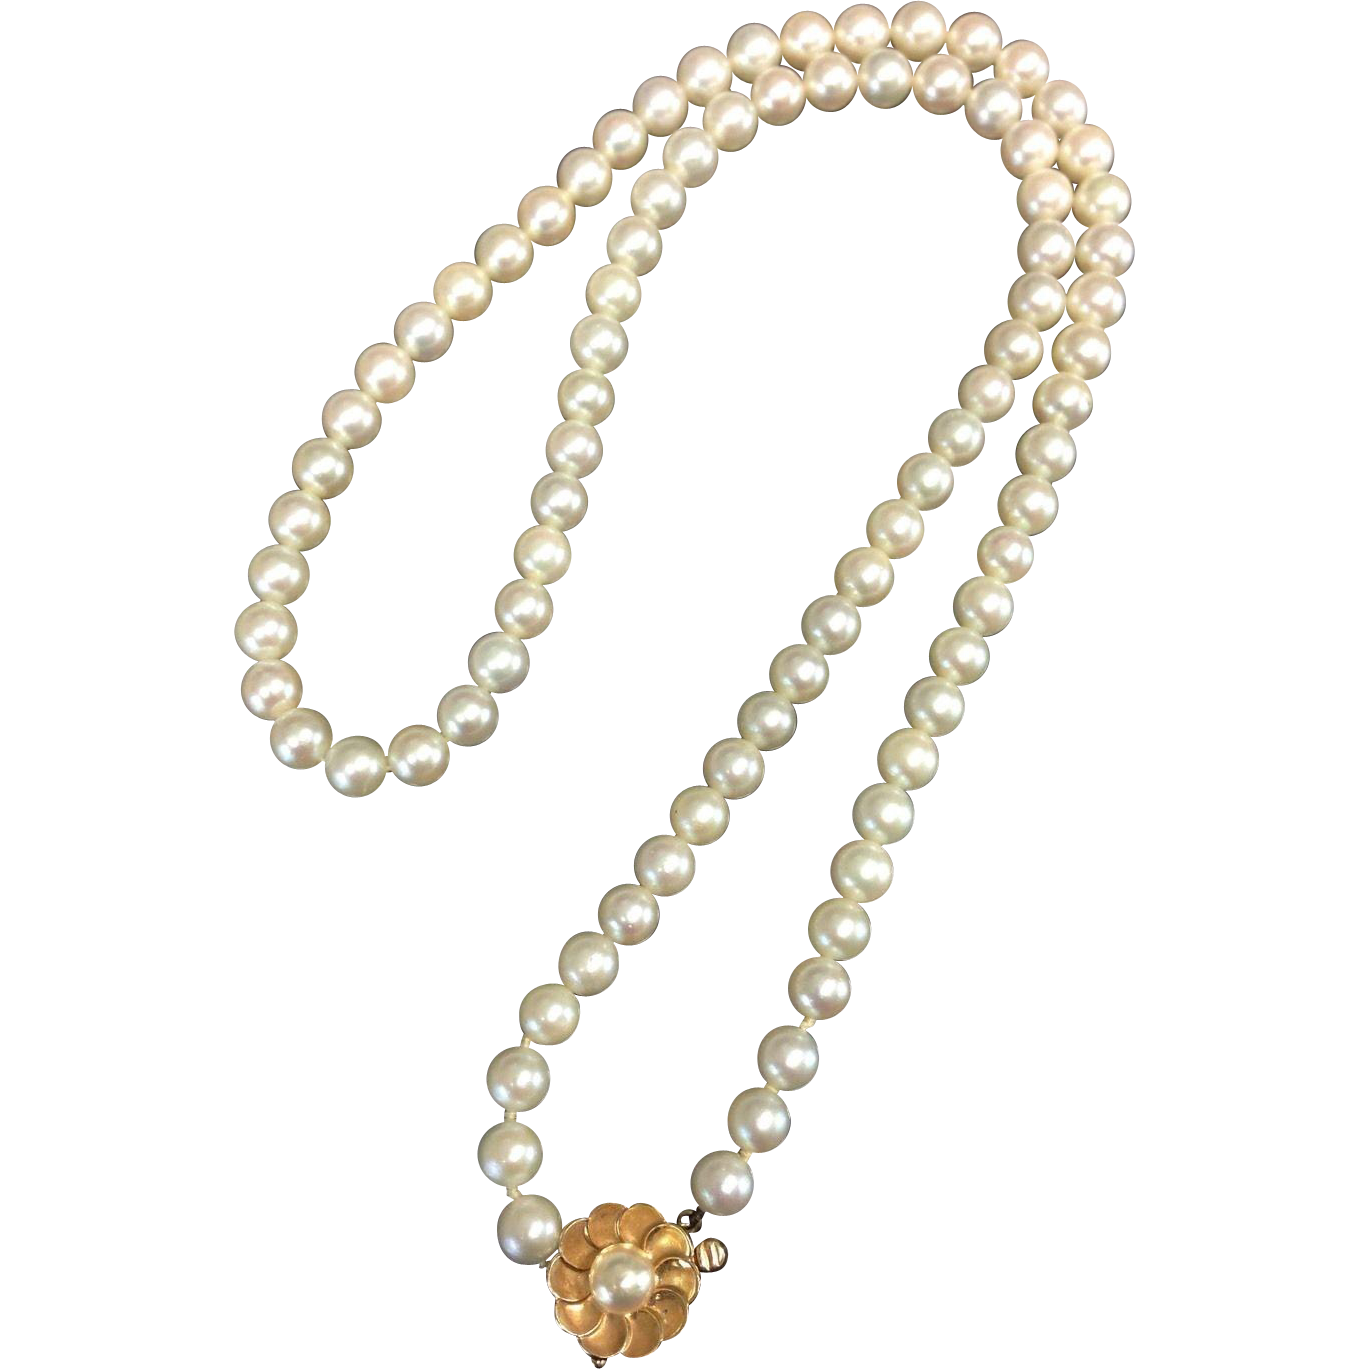 Necklace clipart small black pearl. Beautiful k karat gold